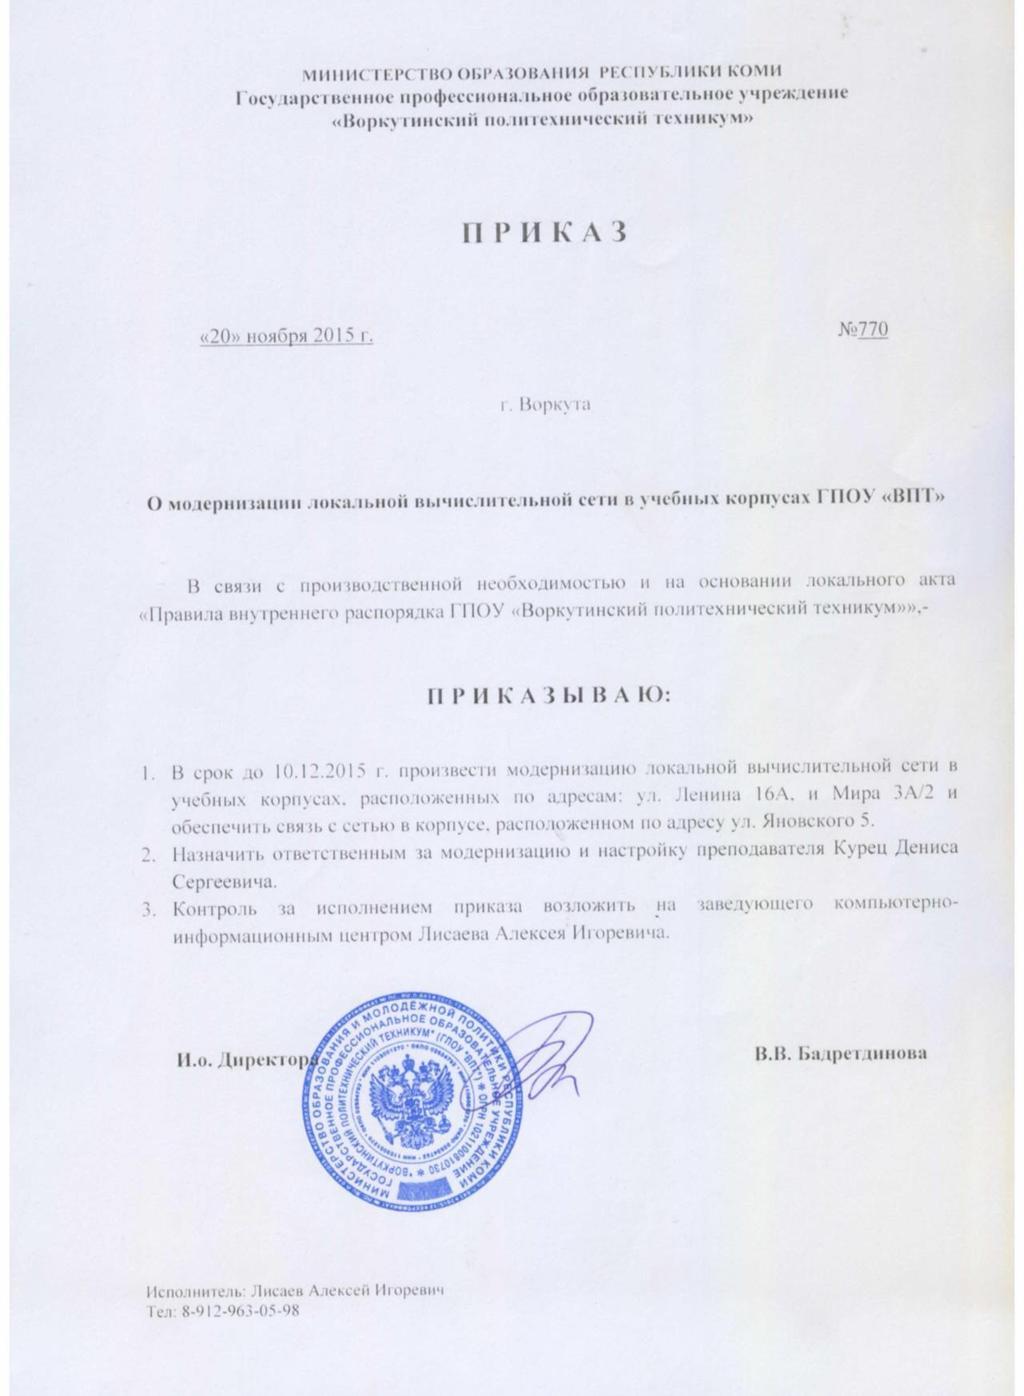 Диета для студента — sportwiki энциклопедия